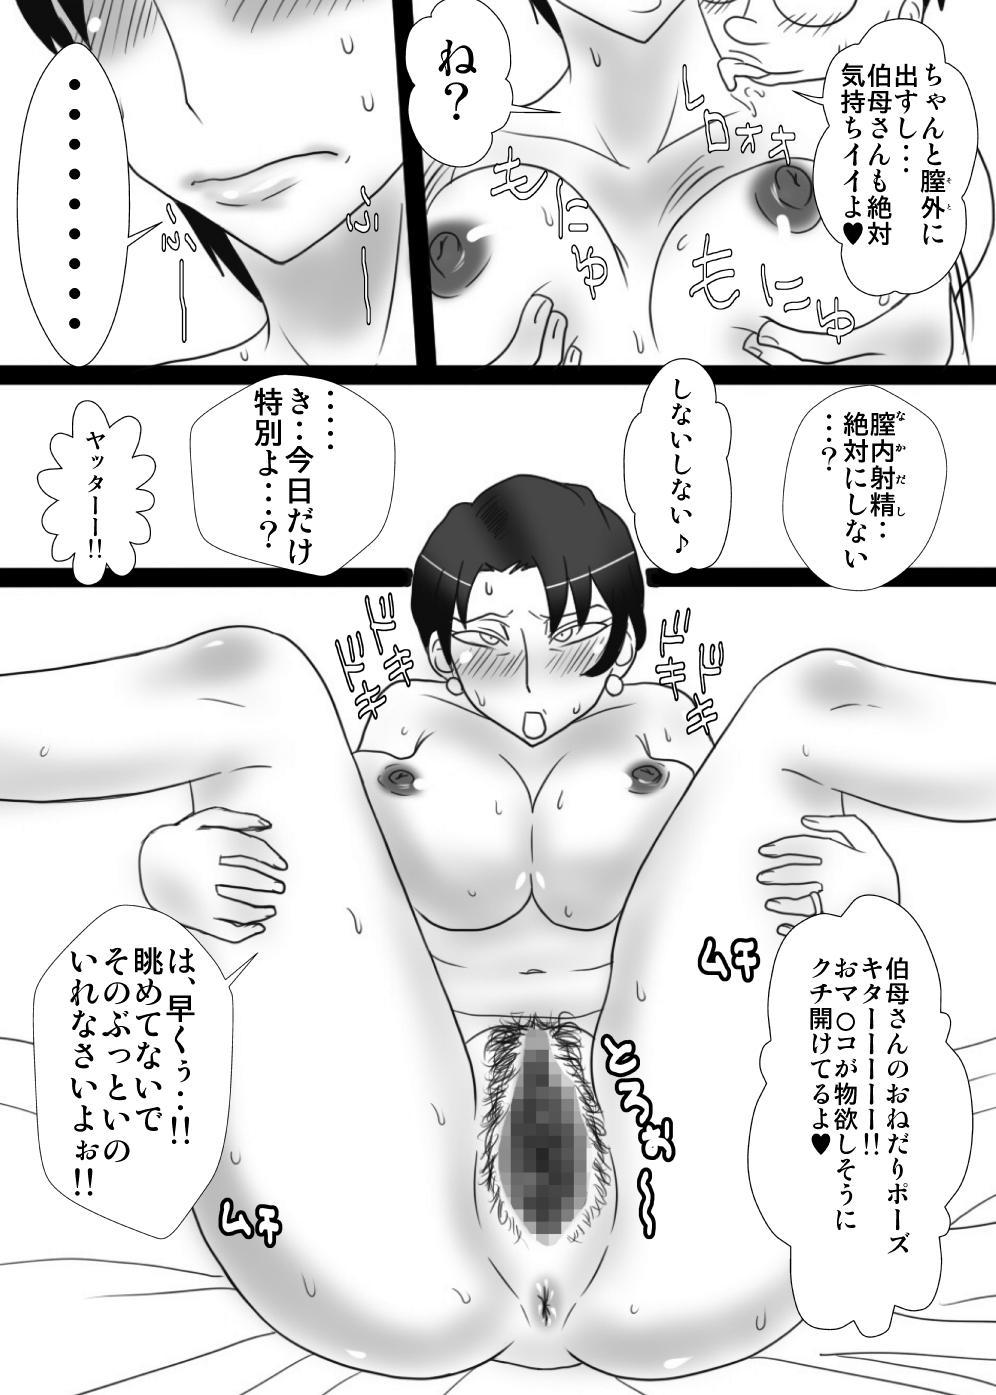 Oba-san o Otosuze! 35